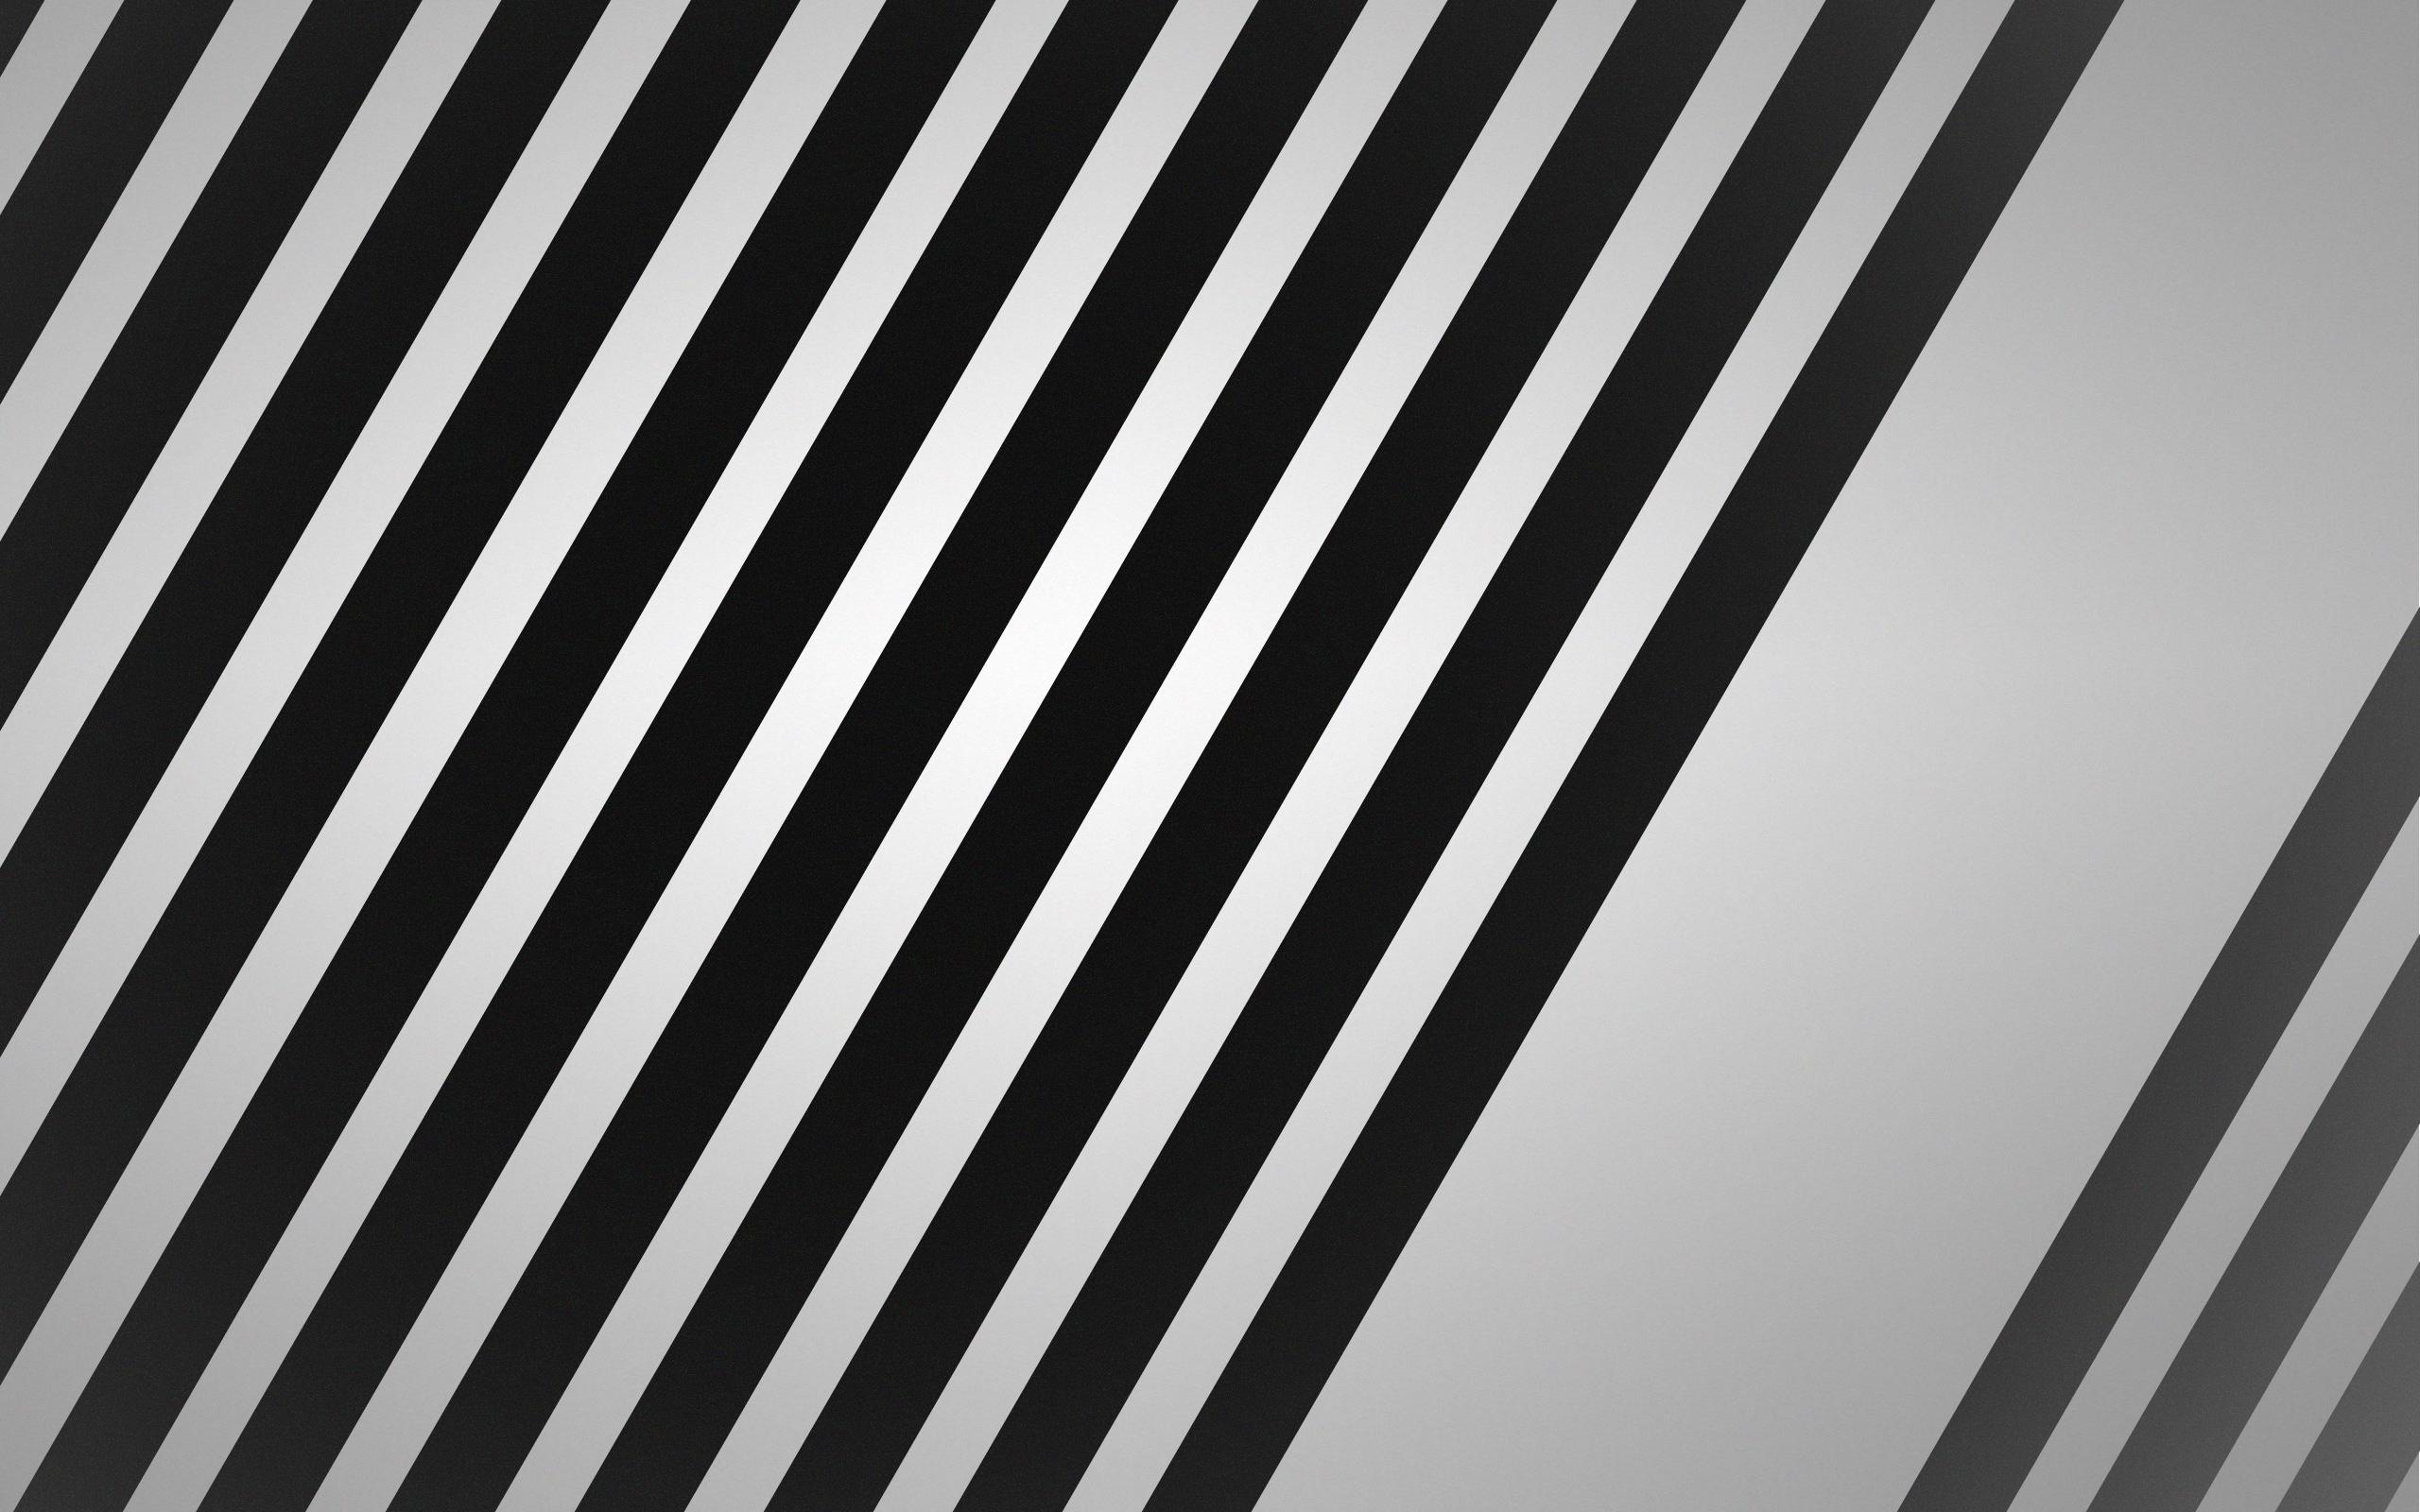 Sleek Slinky Stripes Black 2560x1600 By MarkWester